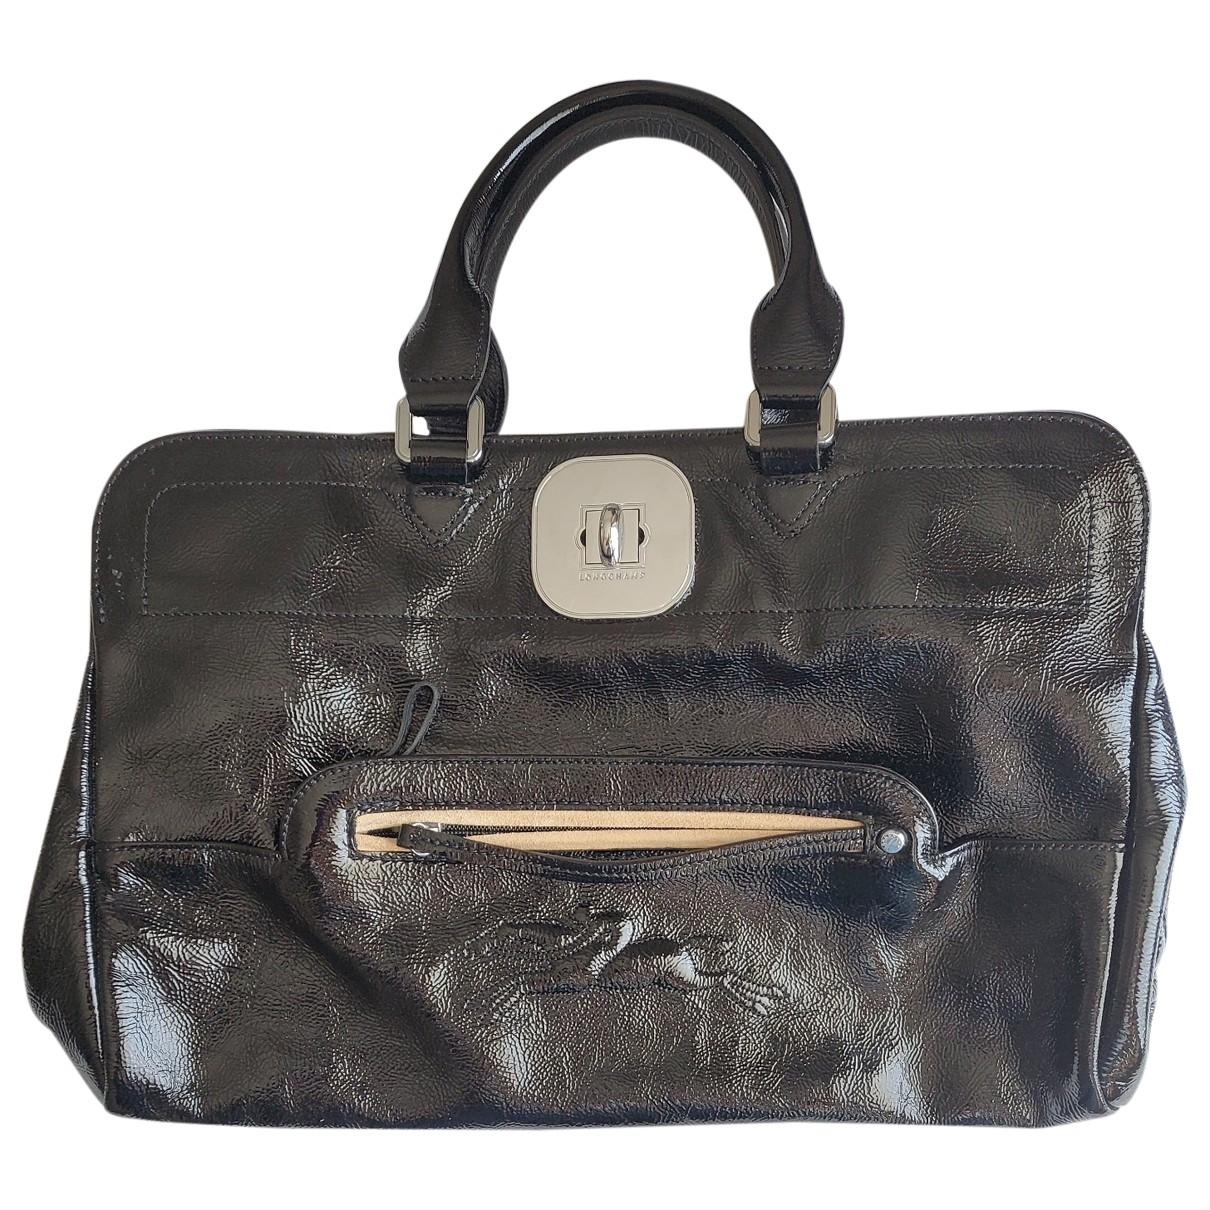 Longchamp Gatsby Black Patent leather handbag for Women \N